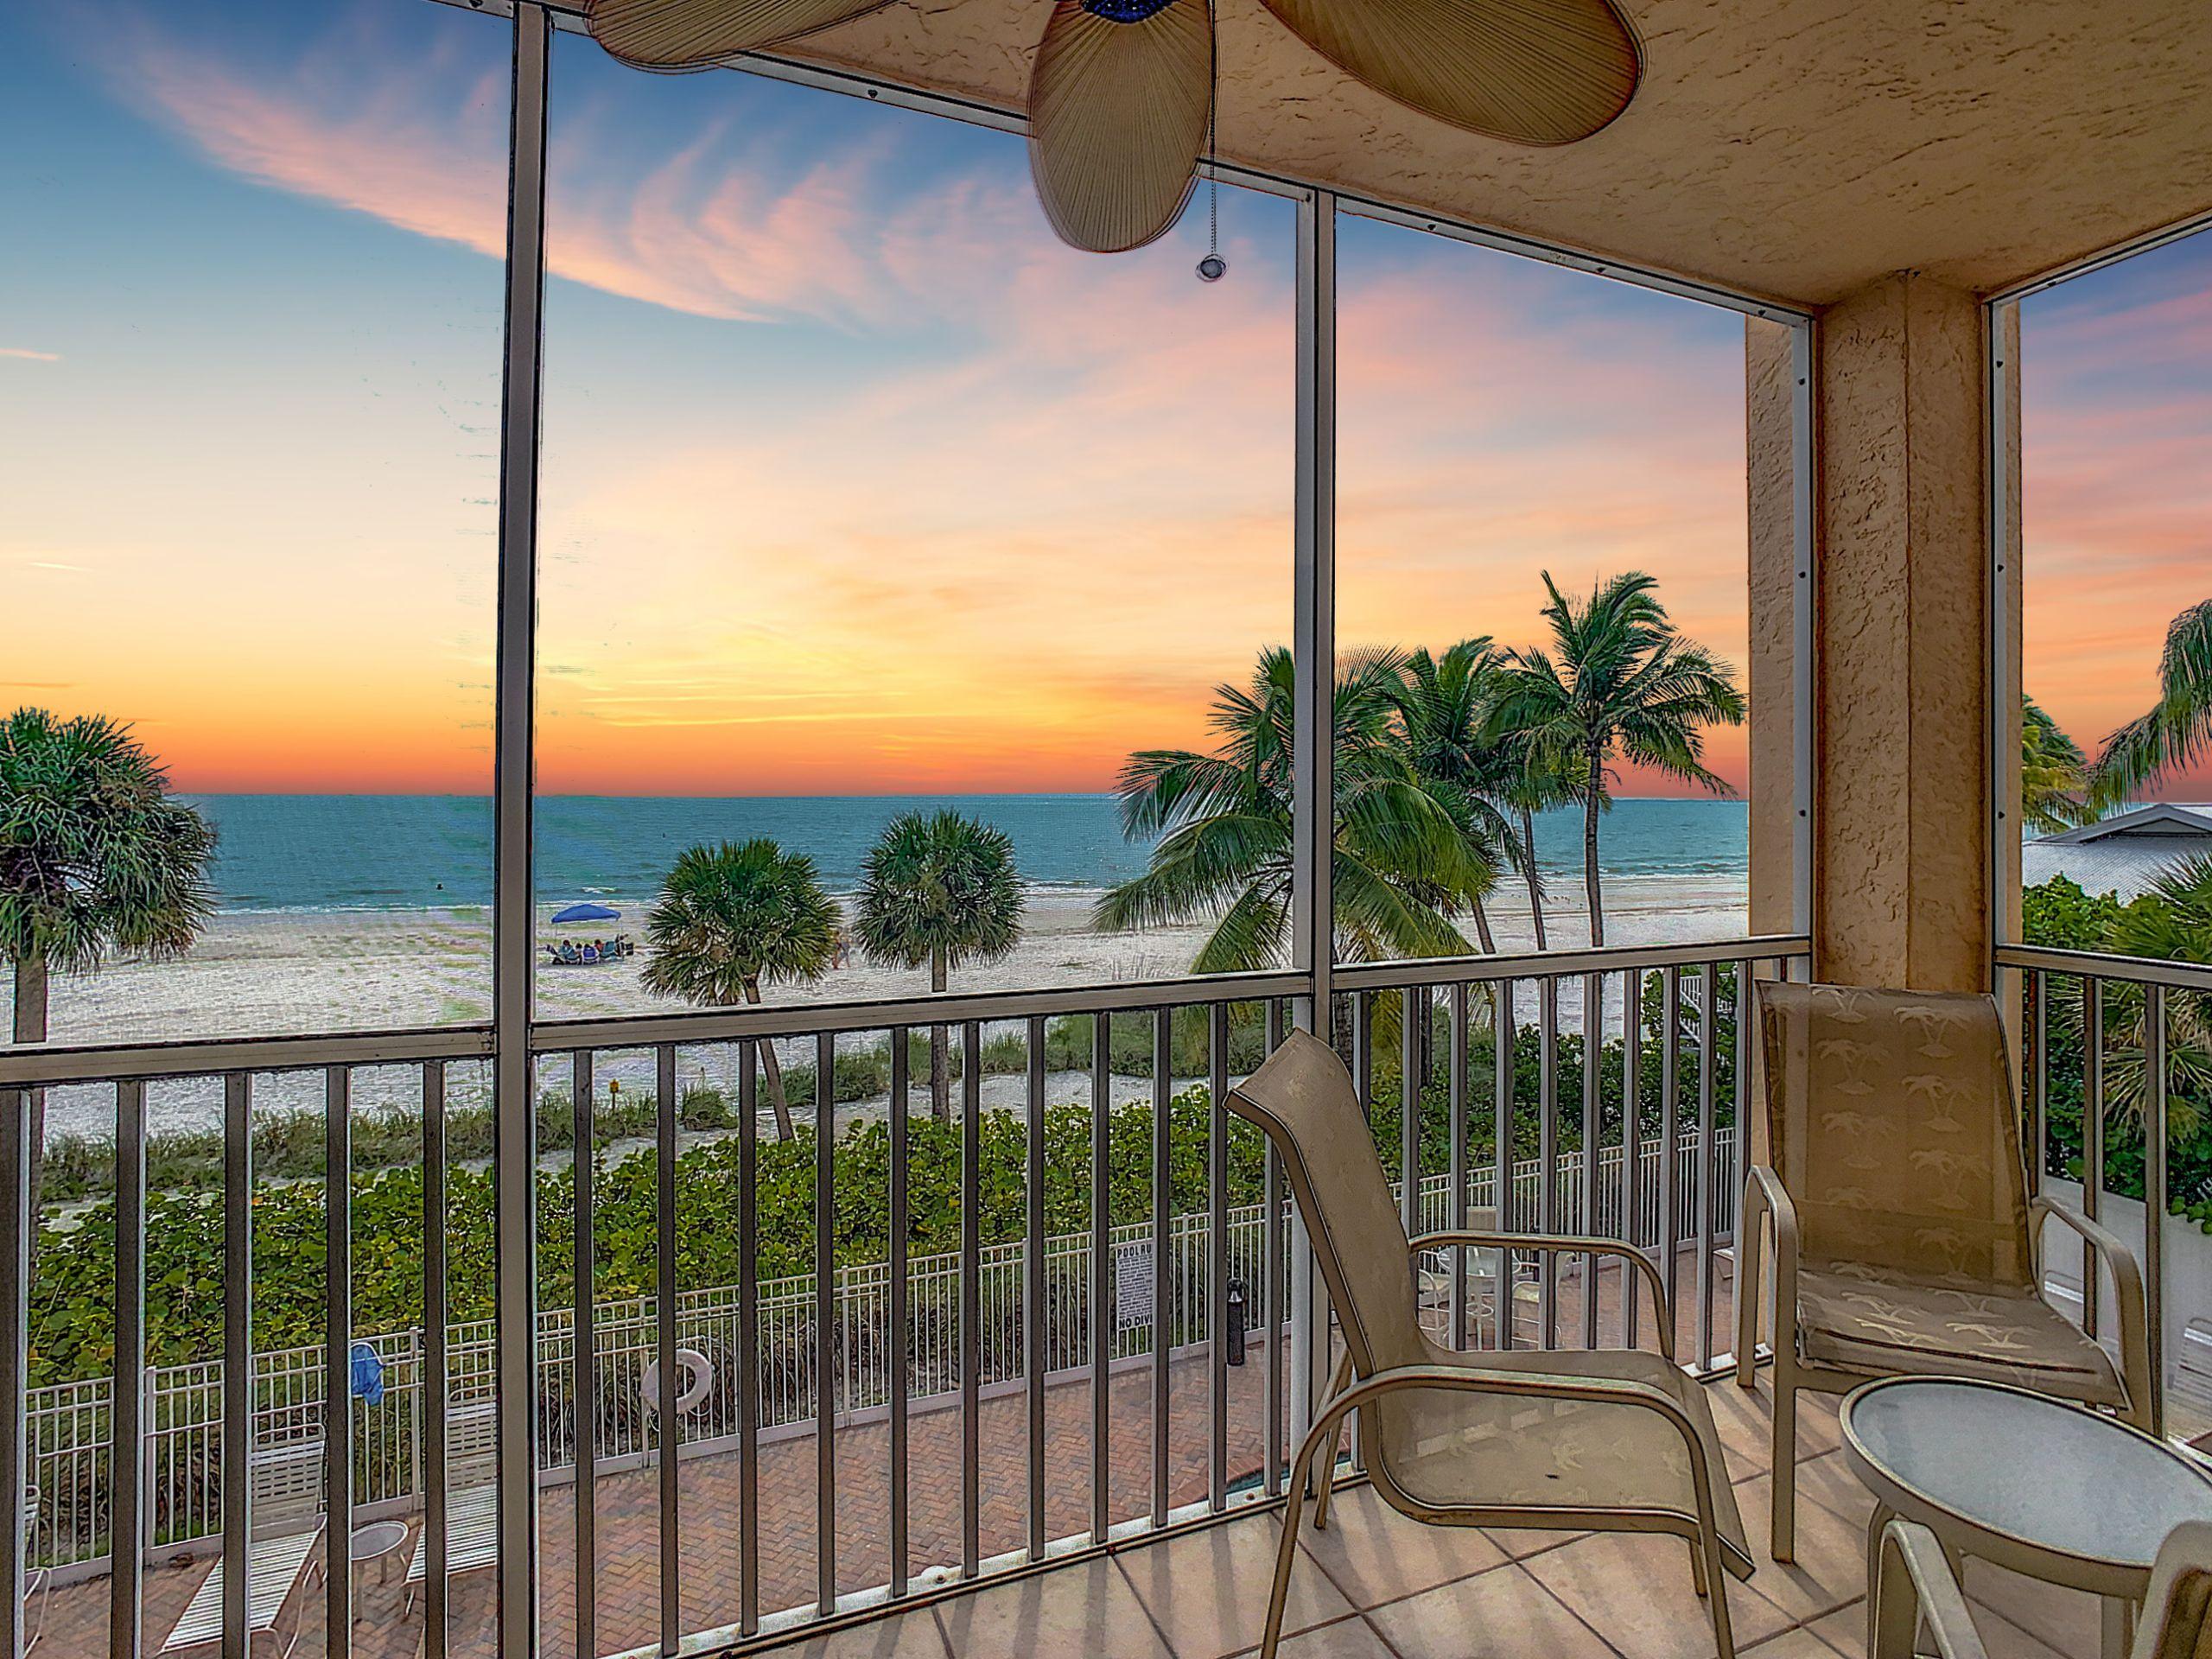 Cornerstone resort style Condo $415,000